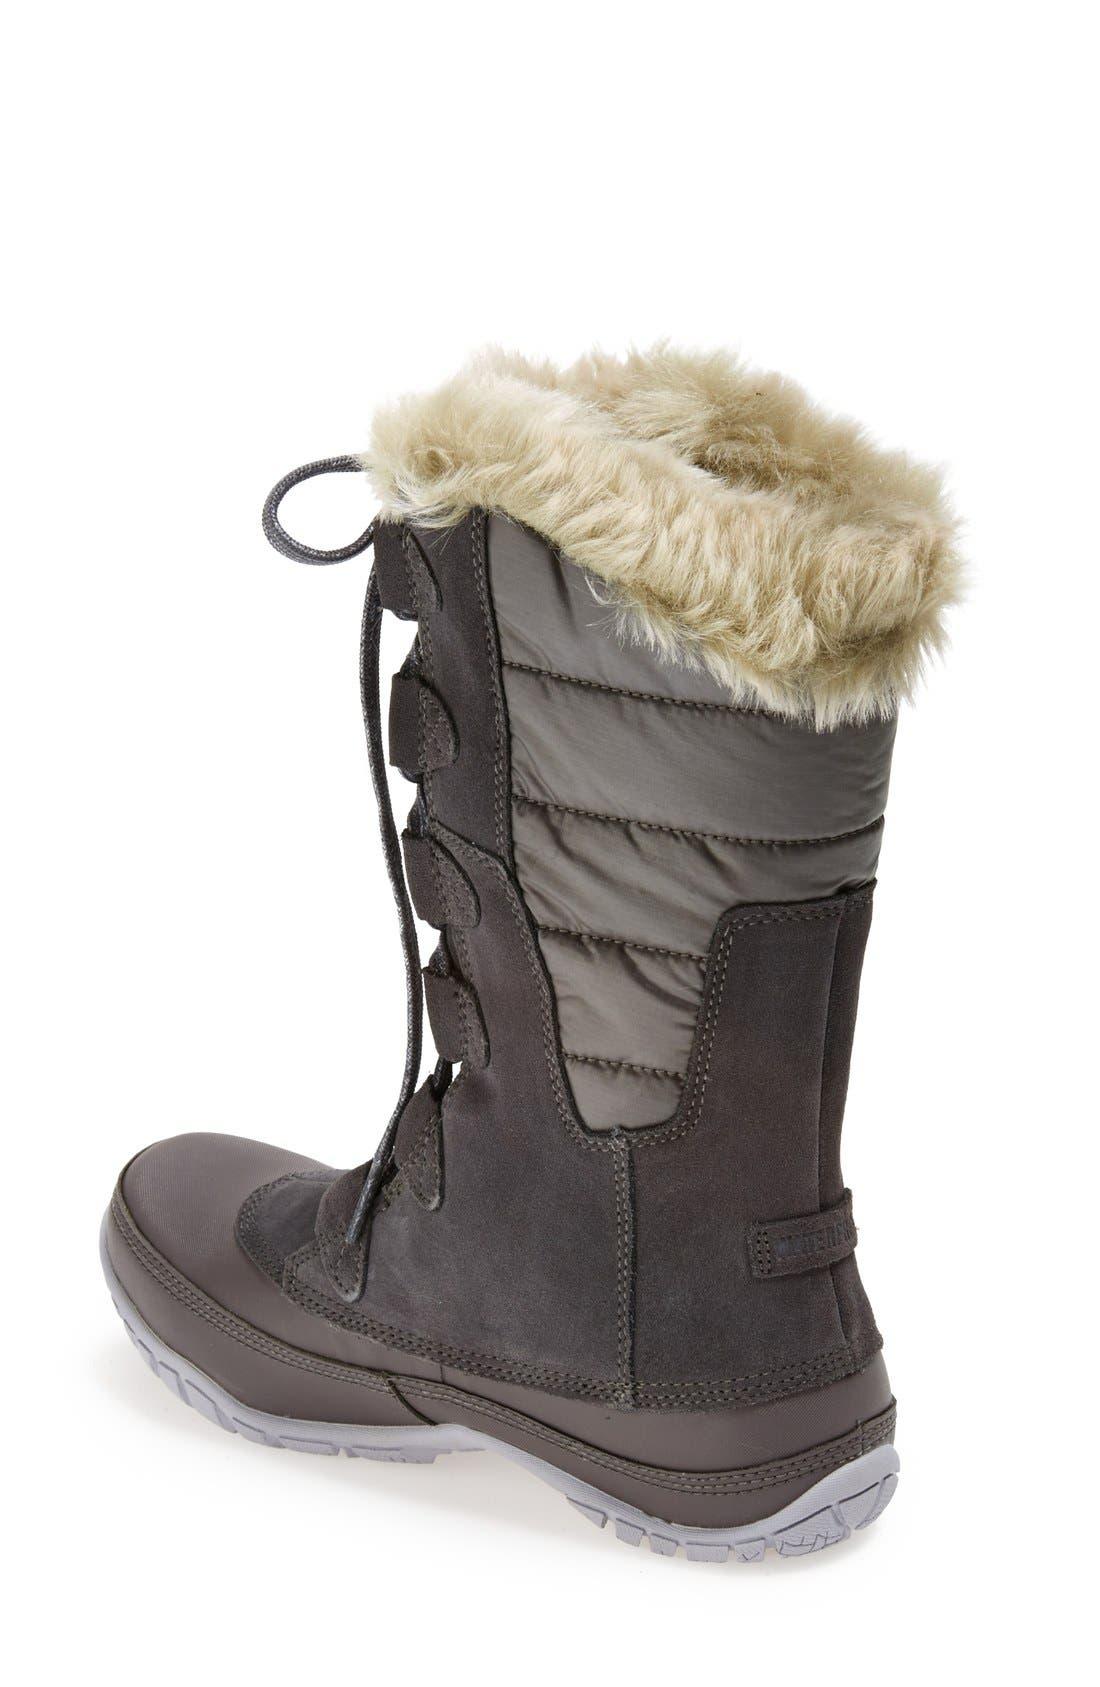 Alternate Image 2  - The North Face 'Nuptse Purna' Waterproof PrimaLoft® Eco Insulated Winter Boot (Women)